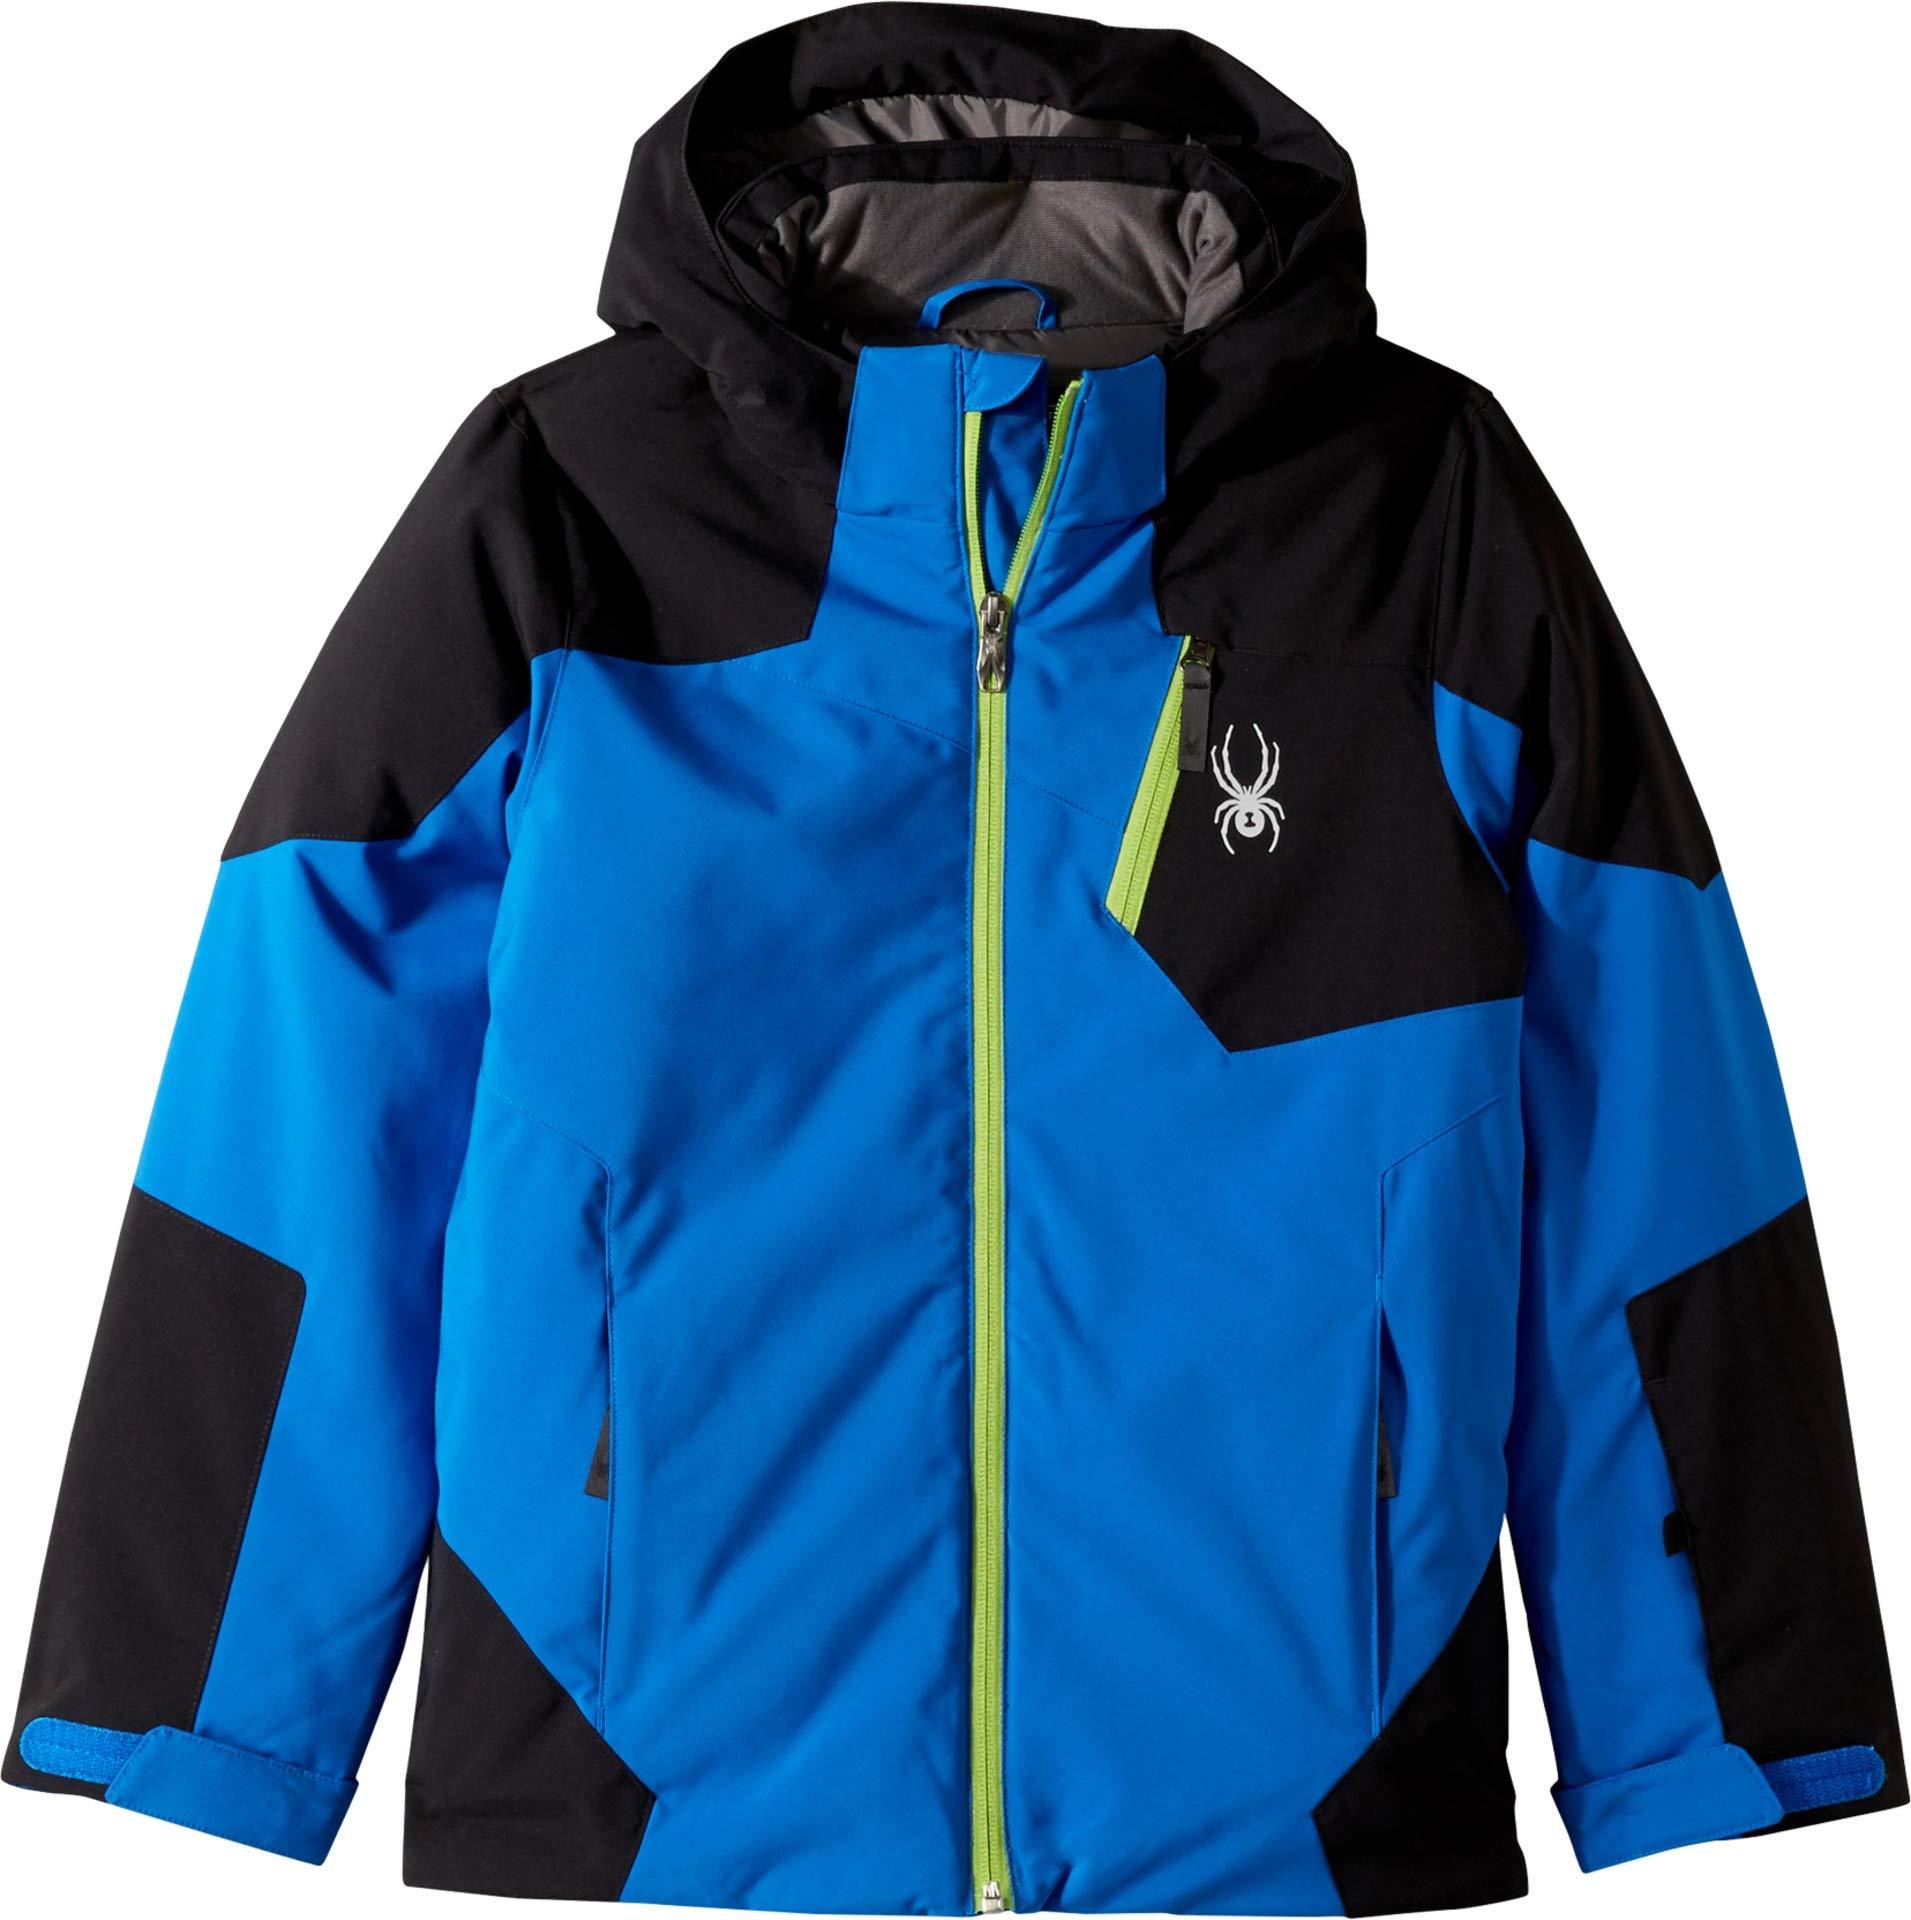 Spyder Boys' Chambers Ski Jacket, Turkish Sea/Black/Fresh, Size 8